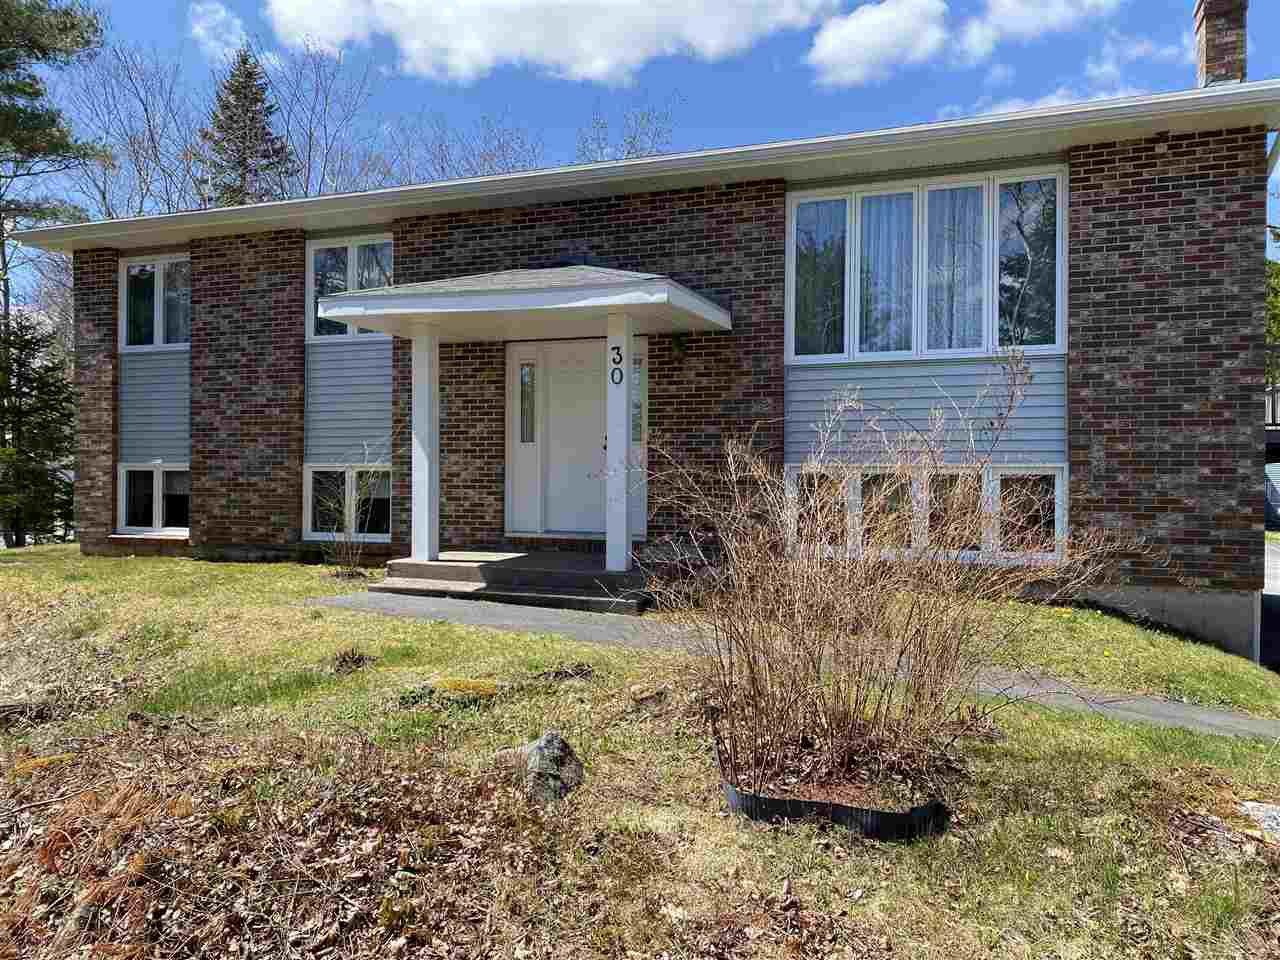 Main Photo: 30 Flat Lake Drive in Stillwater Lake: 21-Kingswood, Haliburton Hills, Hammonds Pl. Residential for sale (Halifax-Dartmouth)  : MLS®# 202007473